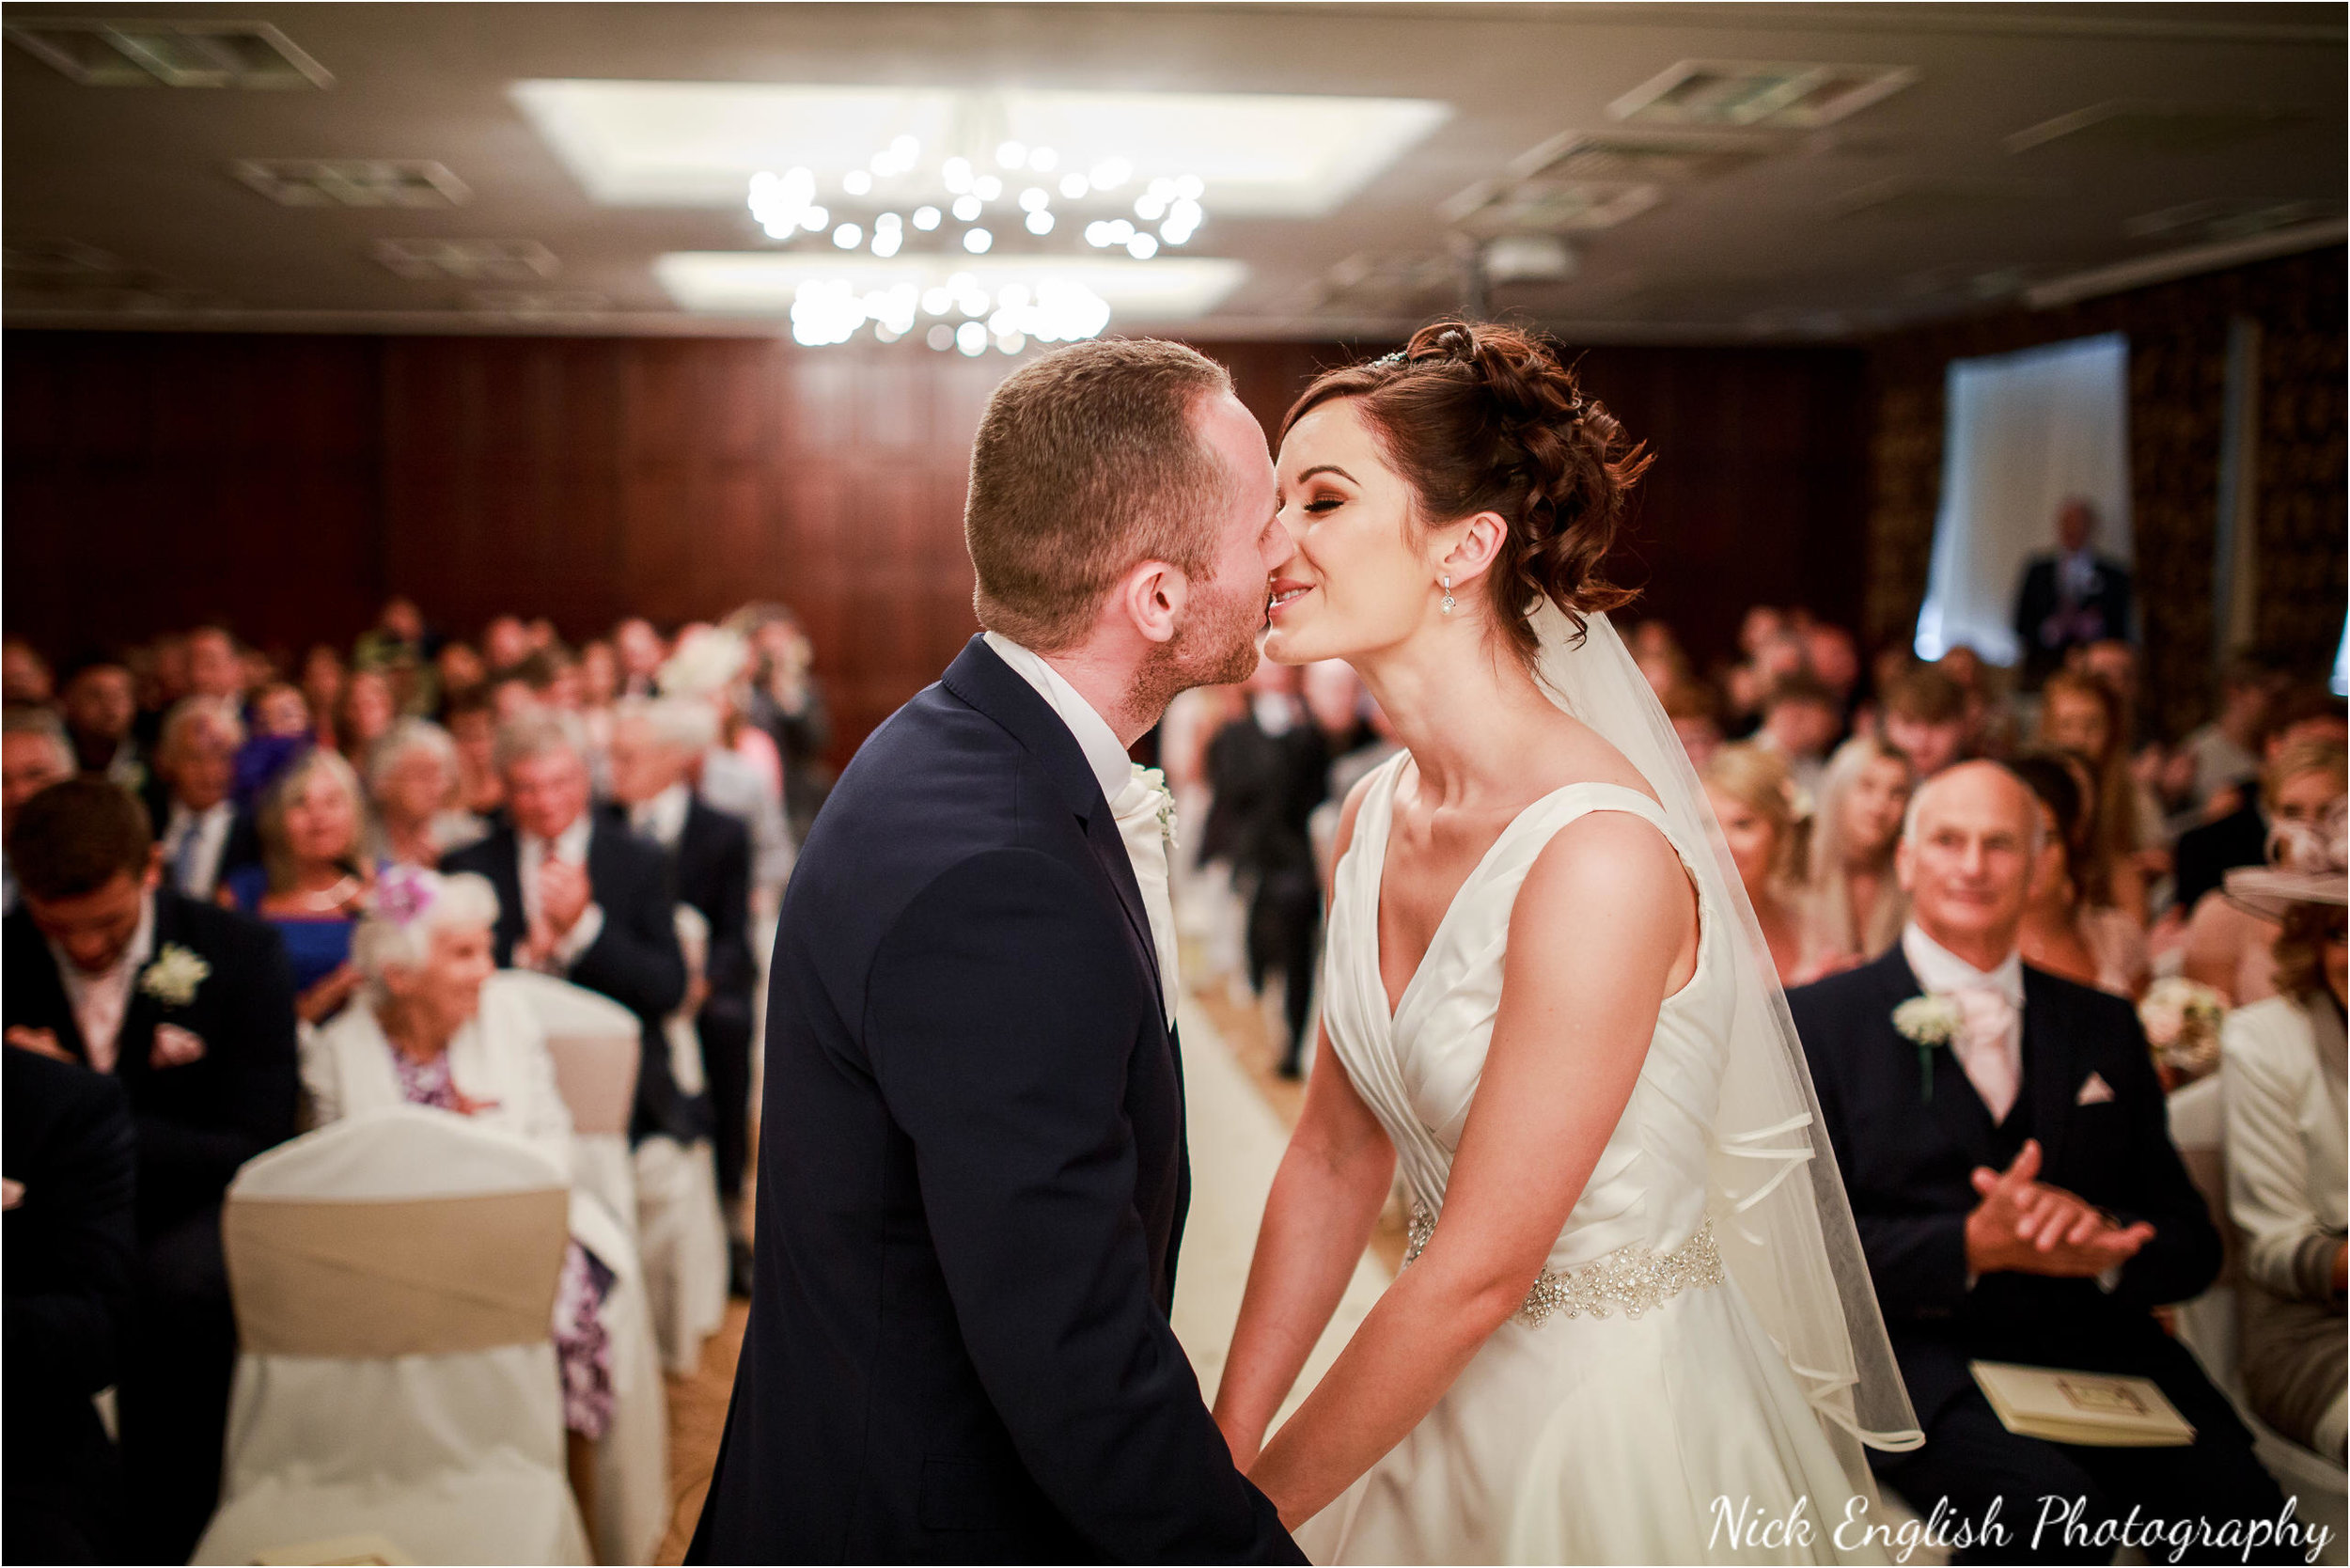 Emily David Wedding Photographs at Barton Grange Preston by Nick English Photography 76jpg.jpeg